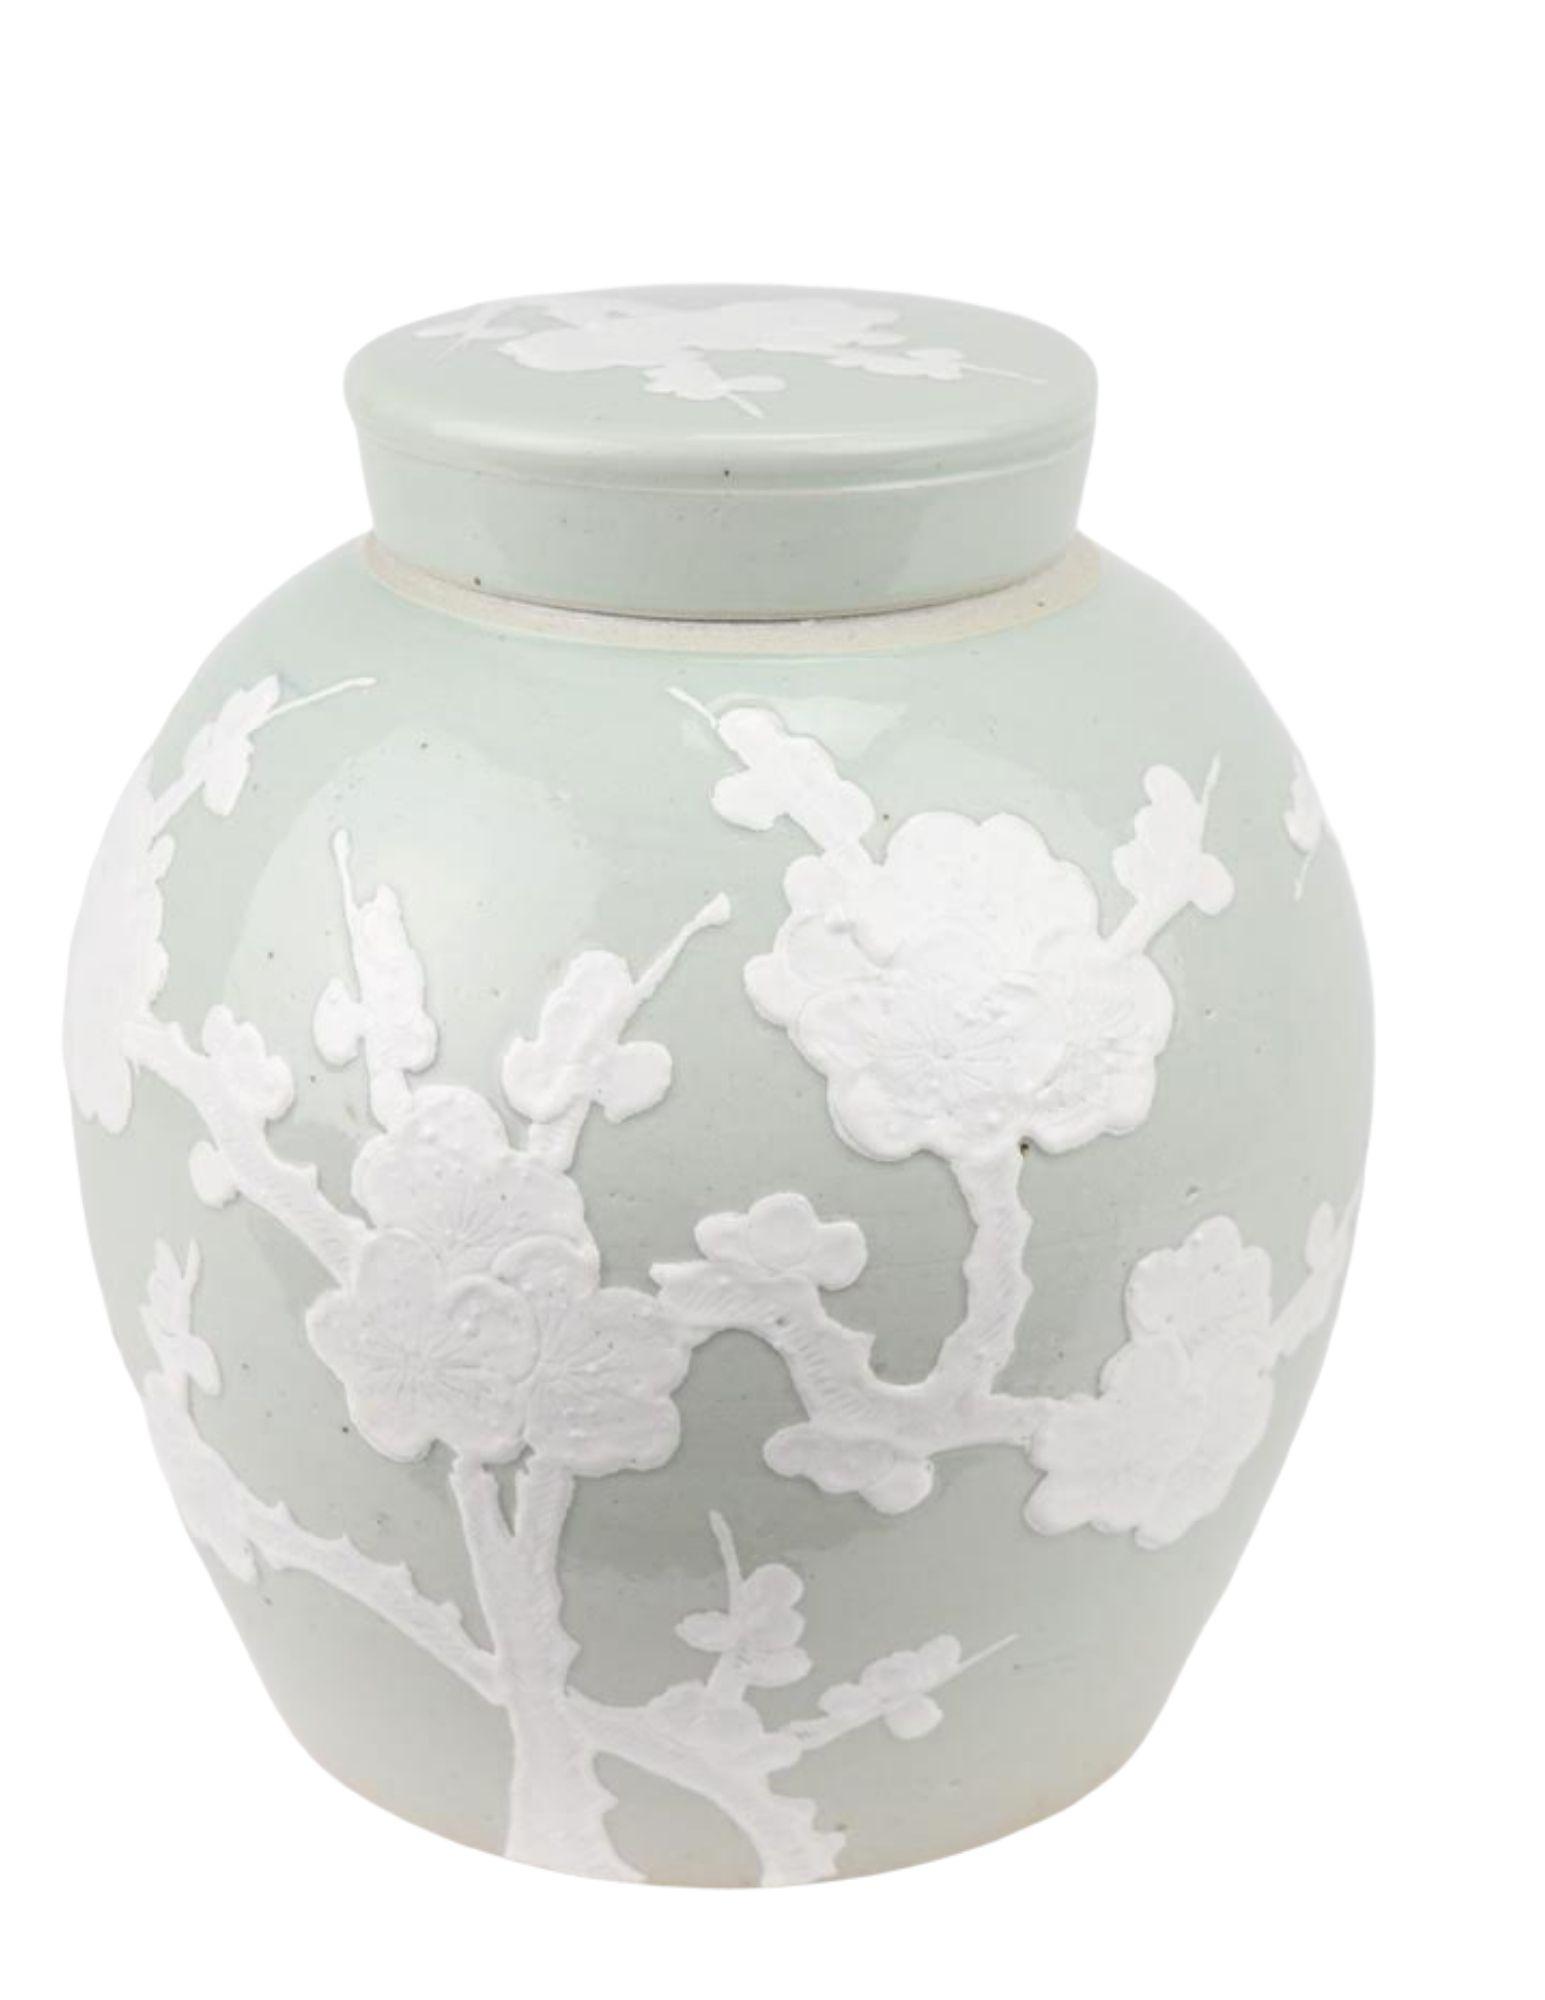 Incredible new flat top pastel ginger jar in pale green